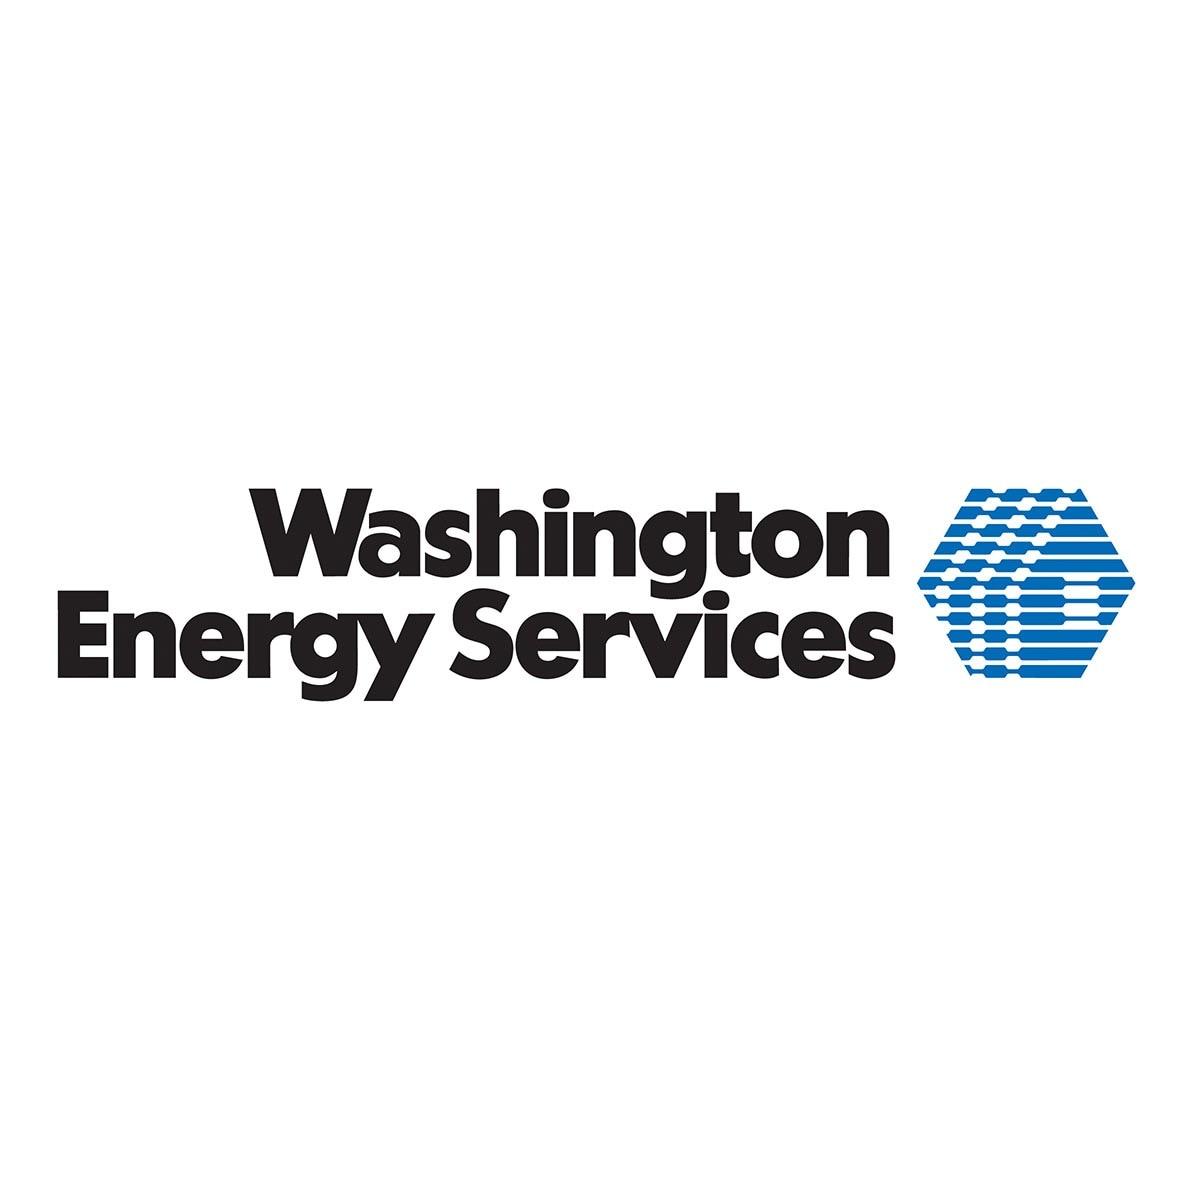 Washington Energy Services logo